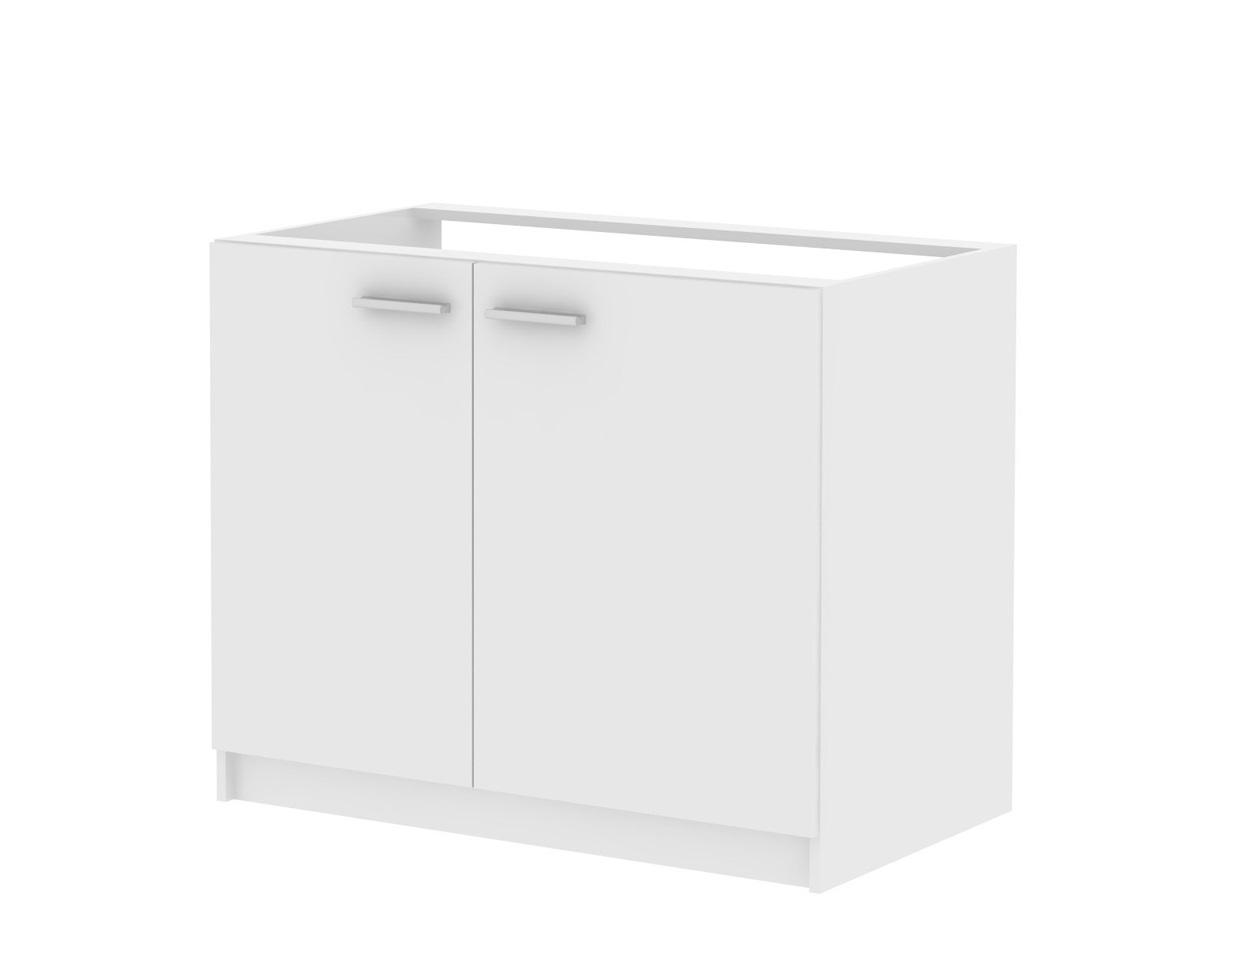 MB Domus Skříňka dvoudveřová pod dřez SMART 22, bílá